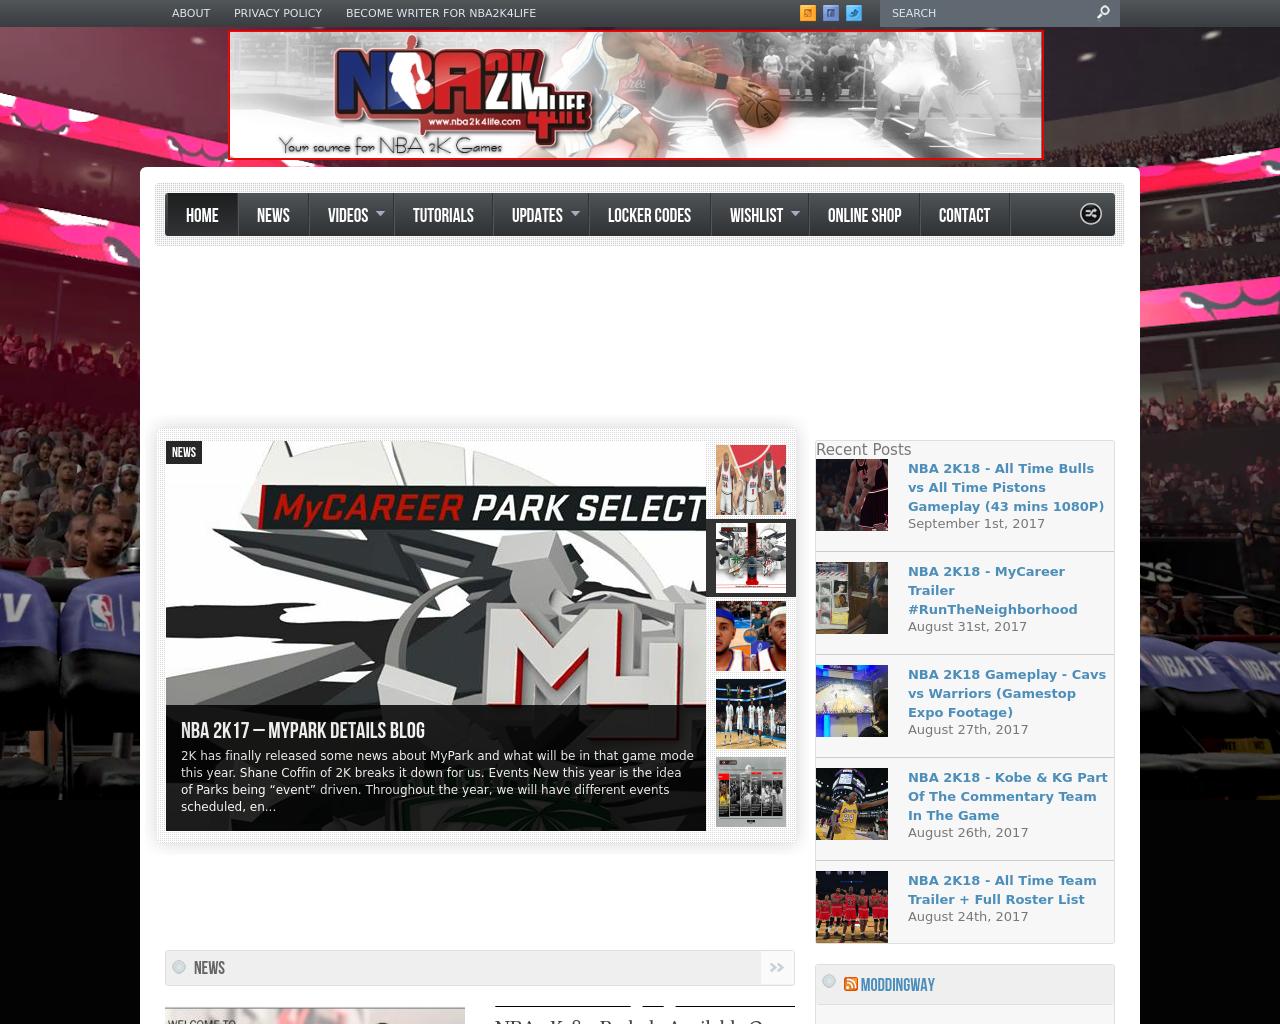 NBA2K4LIFE-Advertising-Reviews-Pricing